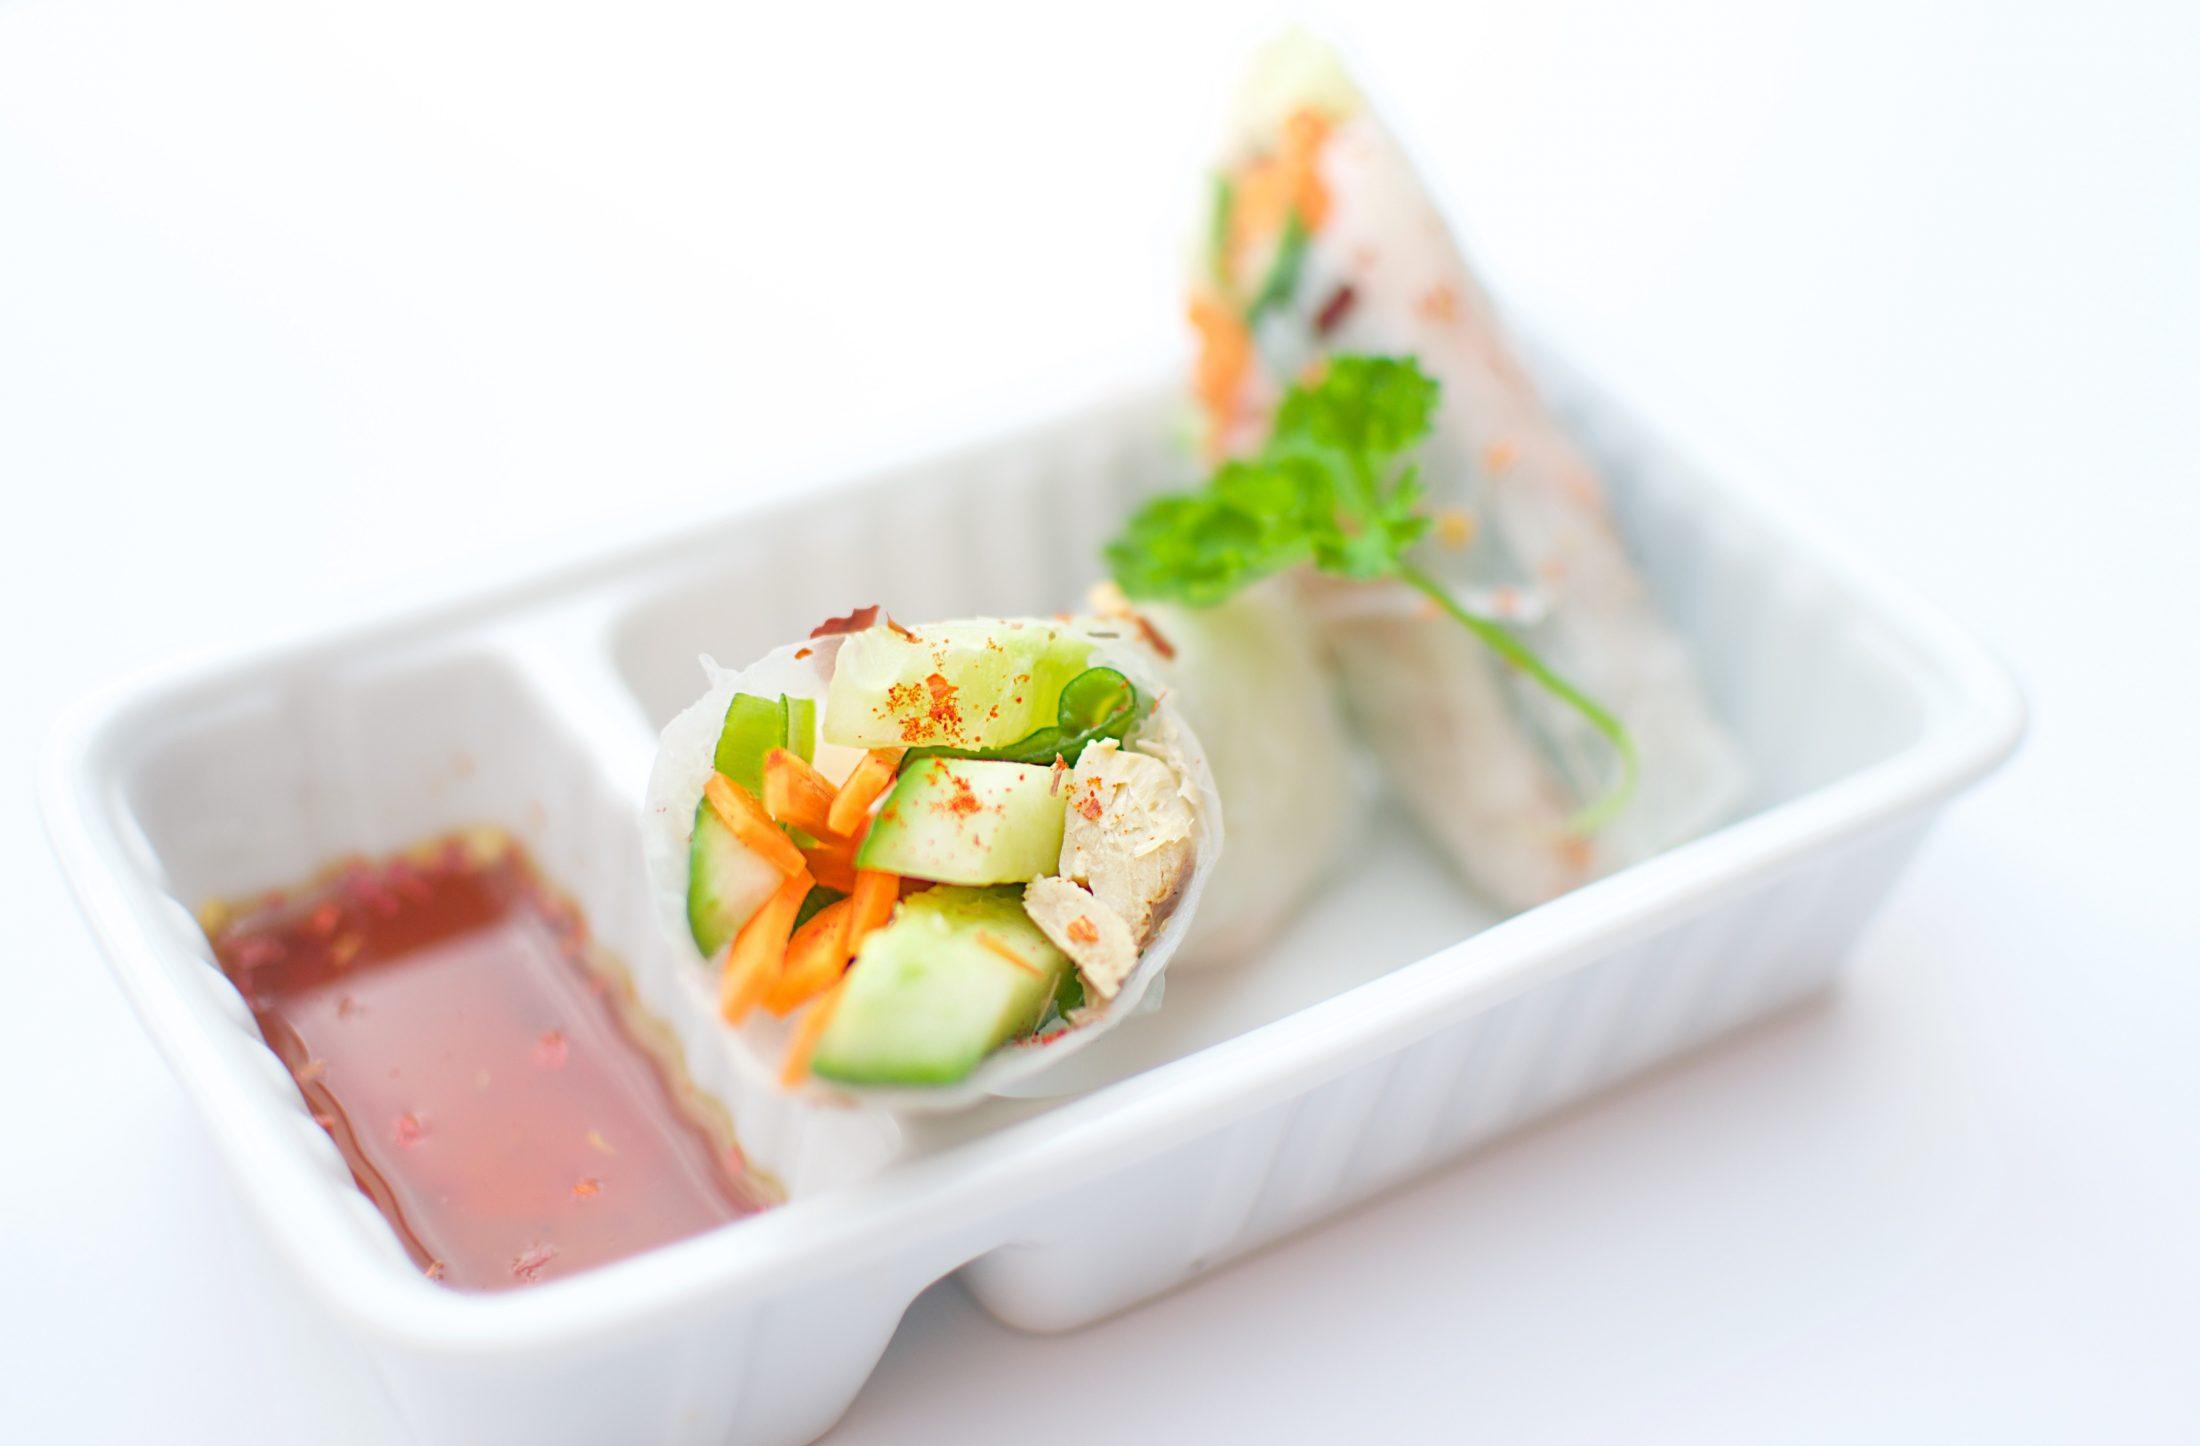 Vietnamese lenterolletjes goi cuon met vis en kip